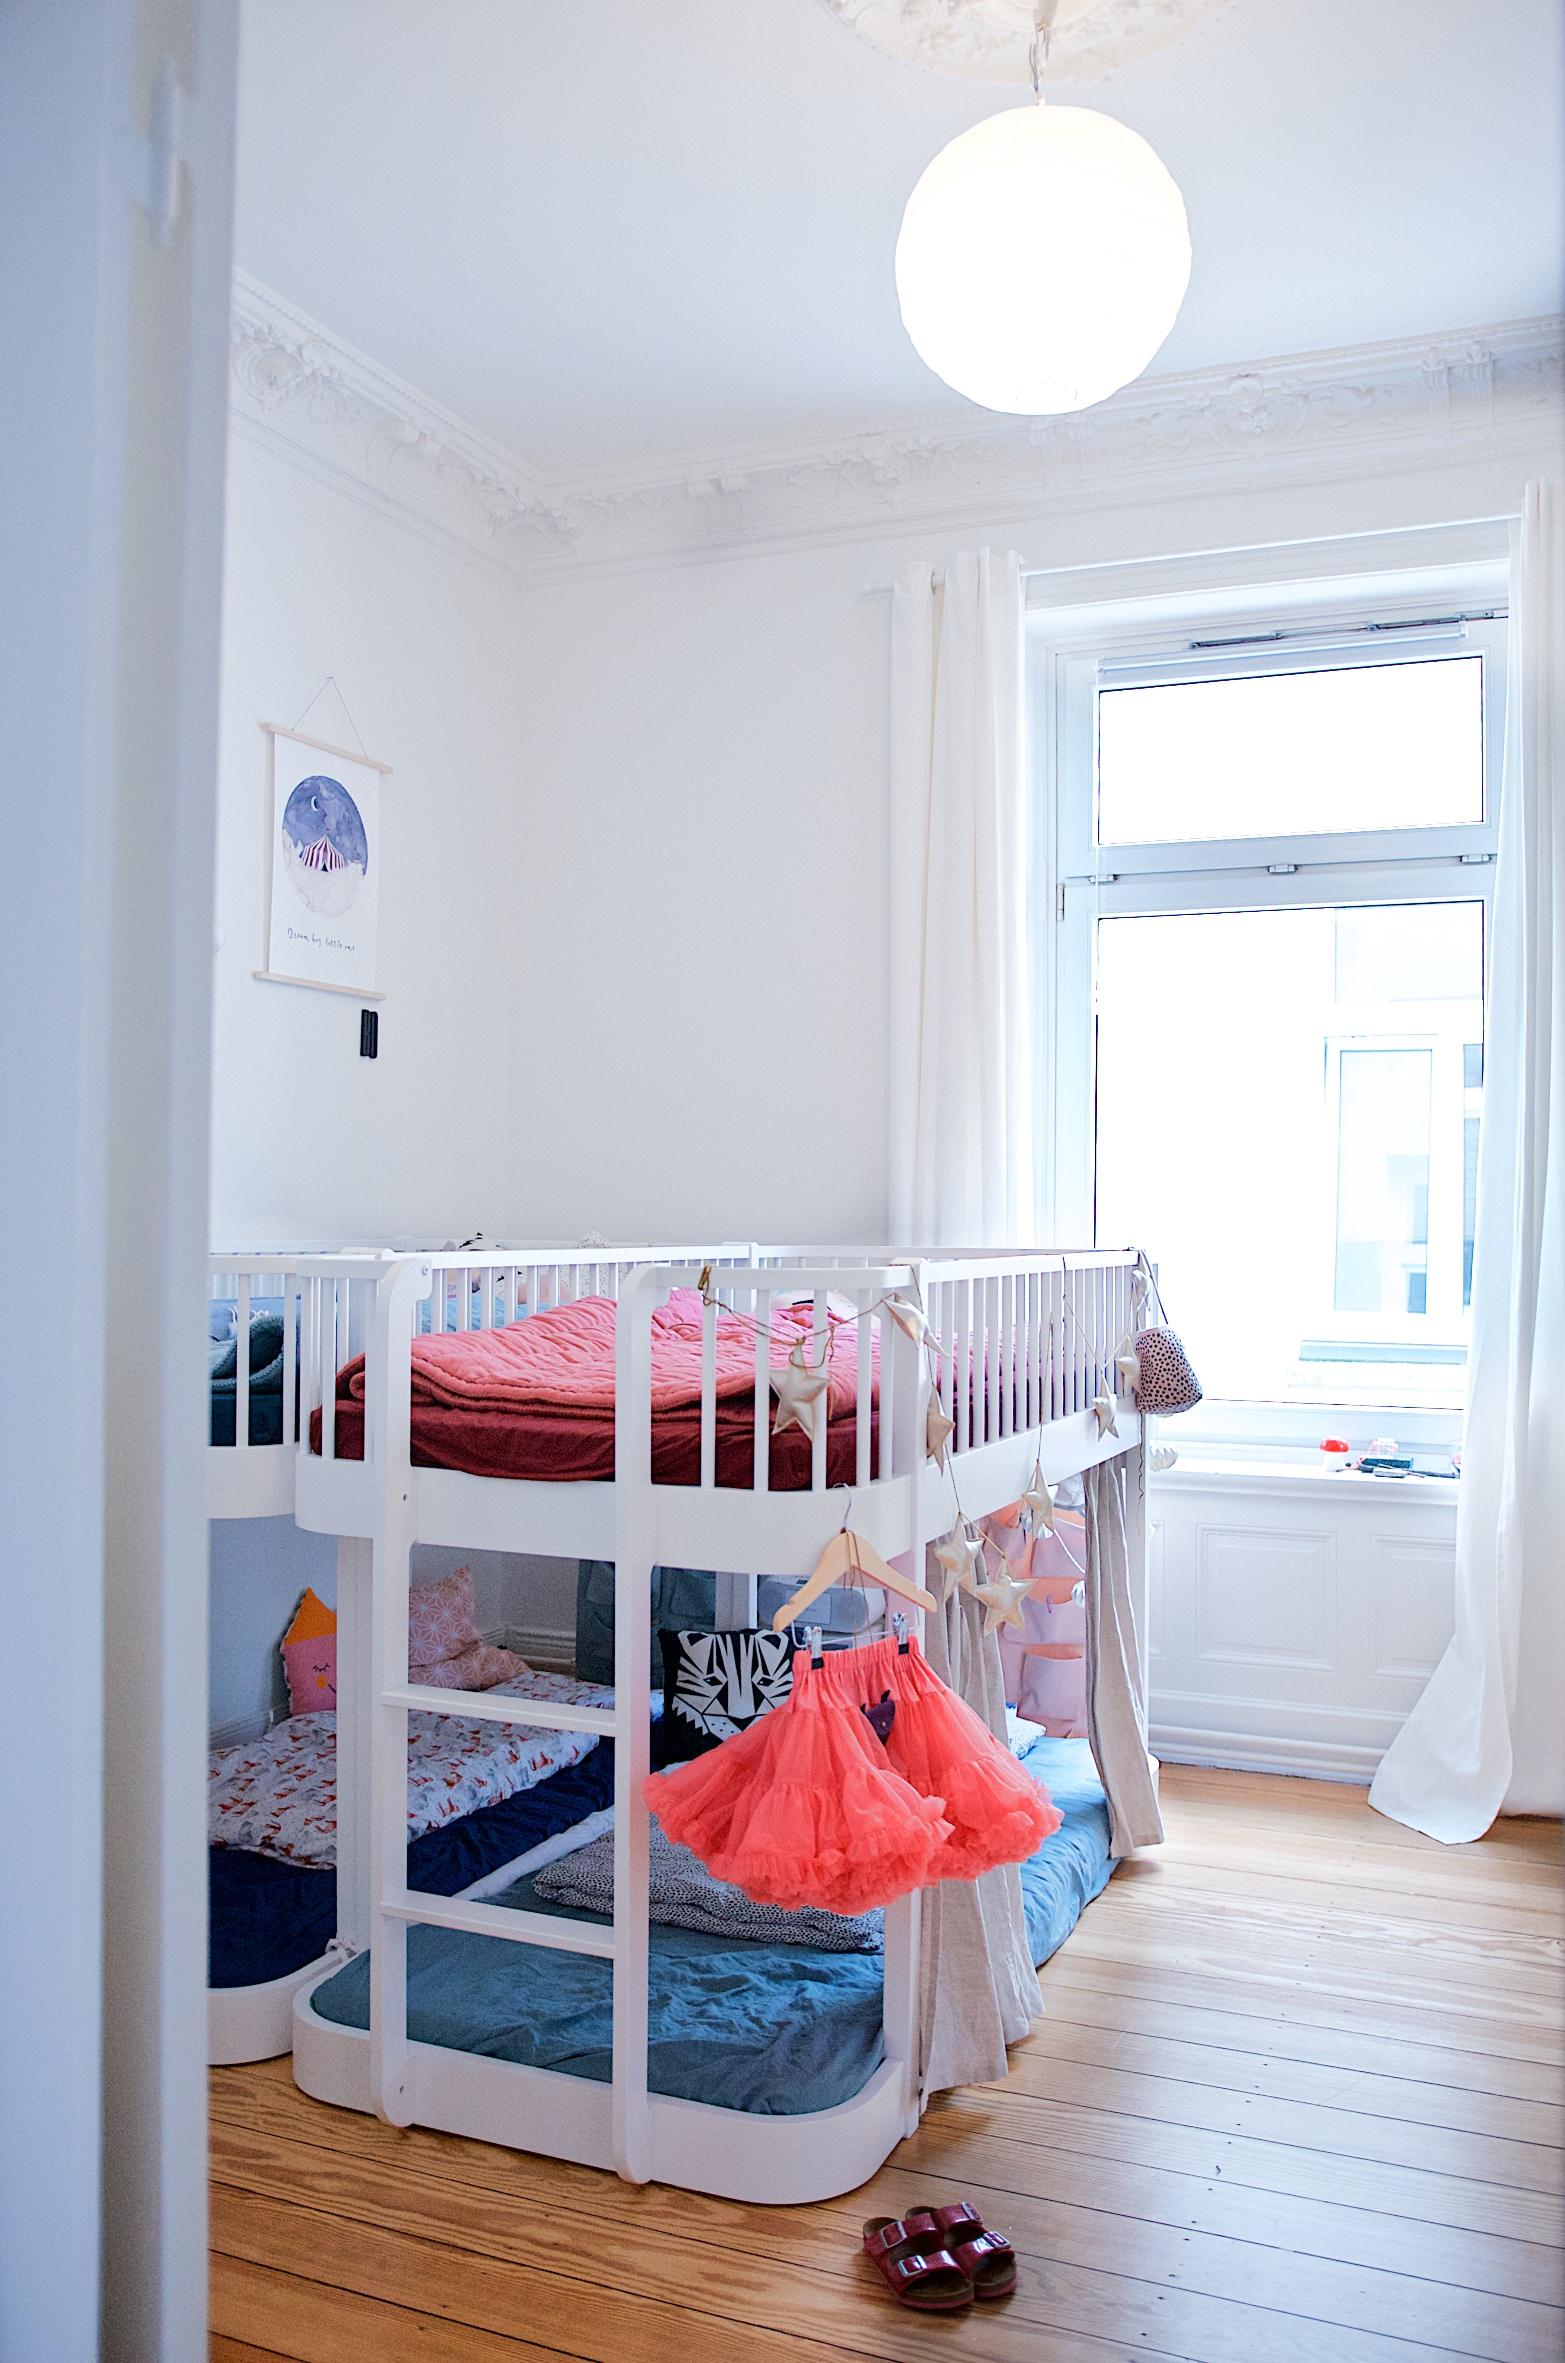 Full Size of Kinderzimmer Regal Regale Weiß Sofa Kinderzimmer Hochbett Kinderzimmer